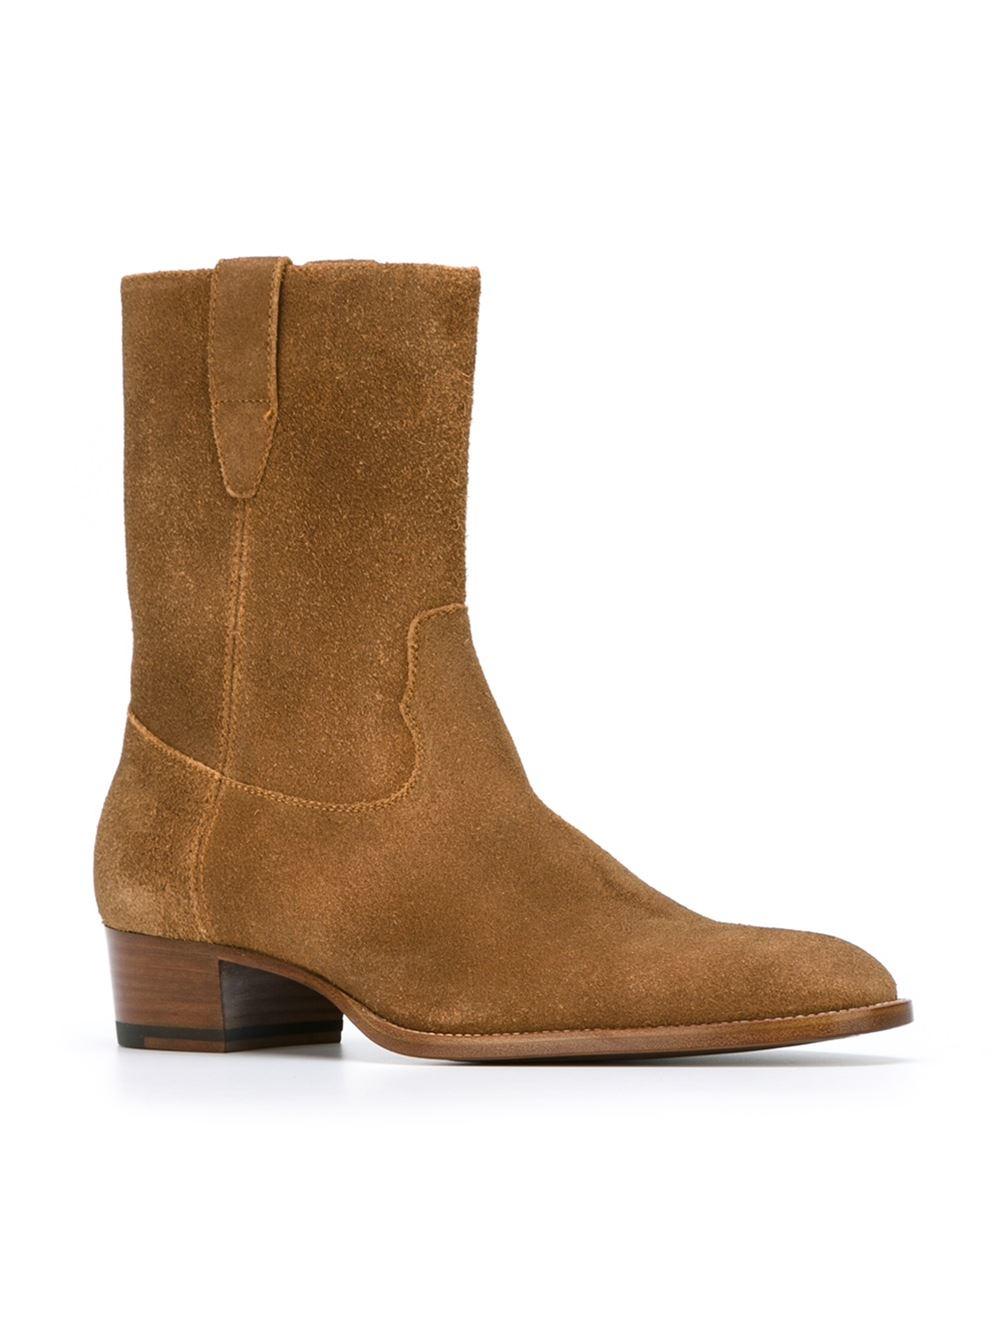 saint laurent 39 hedi 39 ankle boots in beige for men nude neutrals lyst. Black Bedroom Furniture Sets. Home Design Ideas